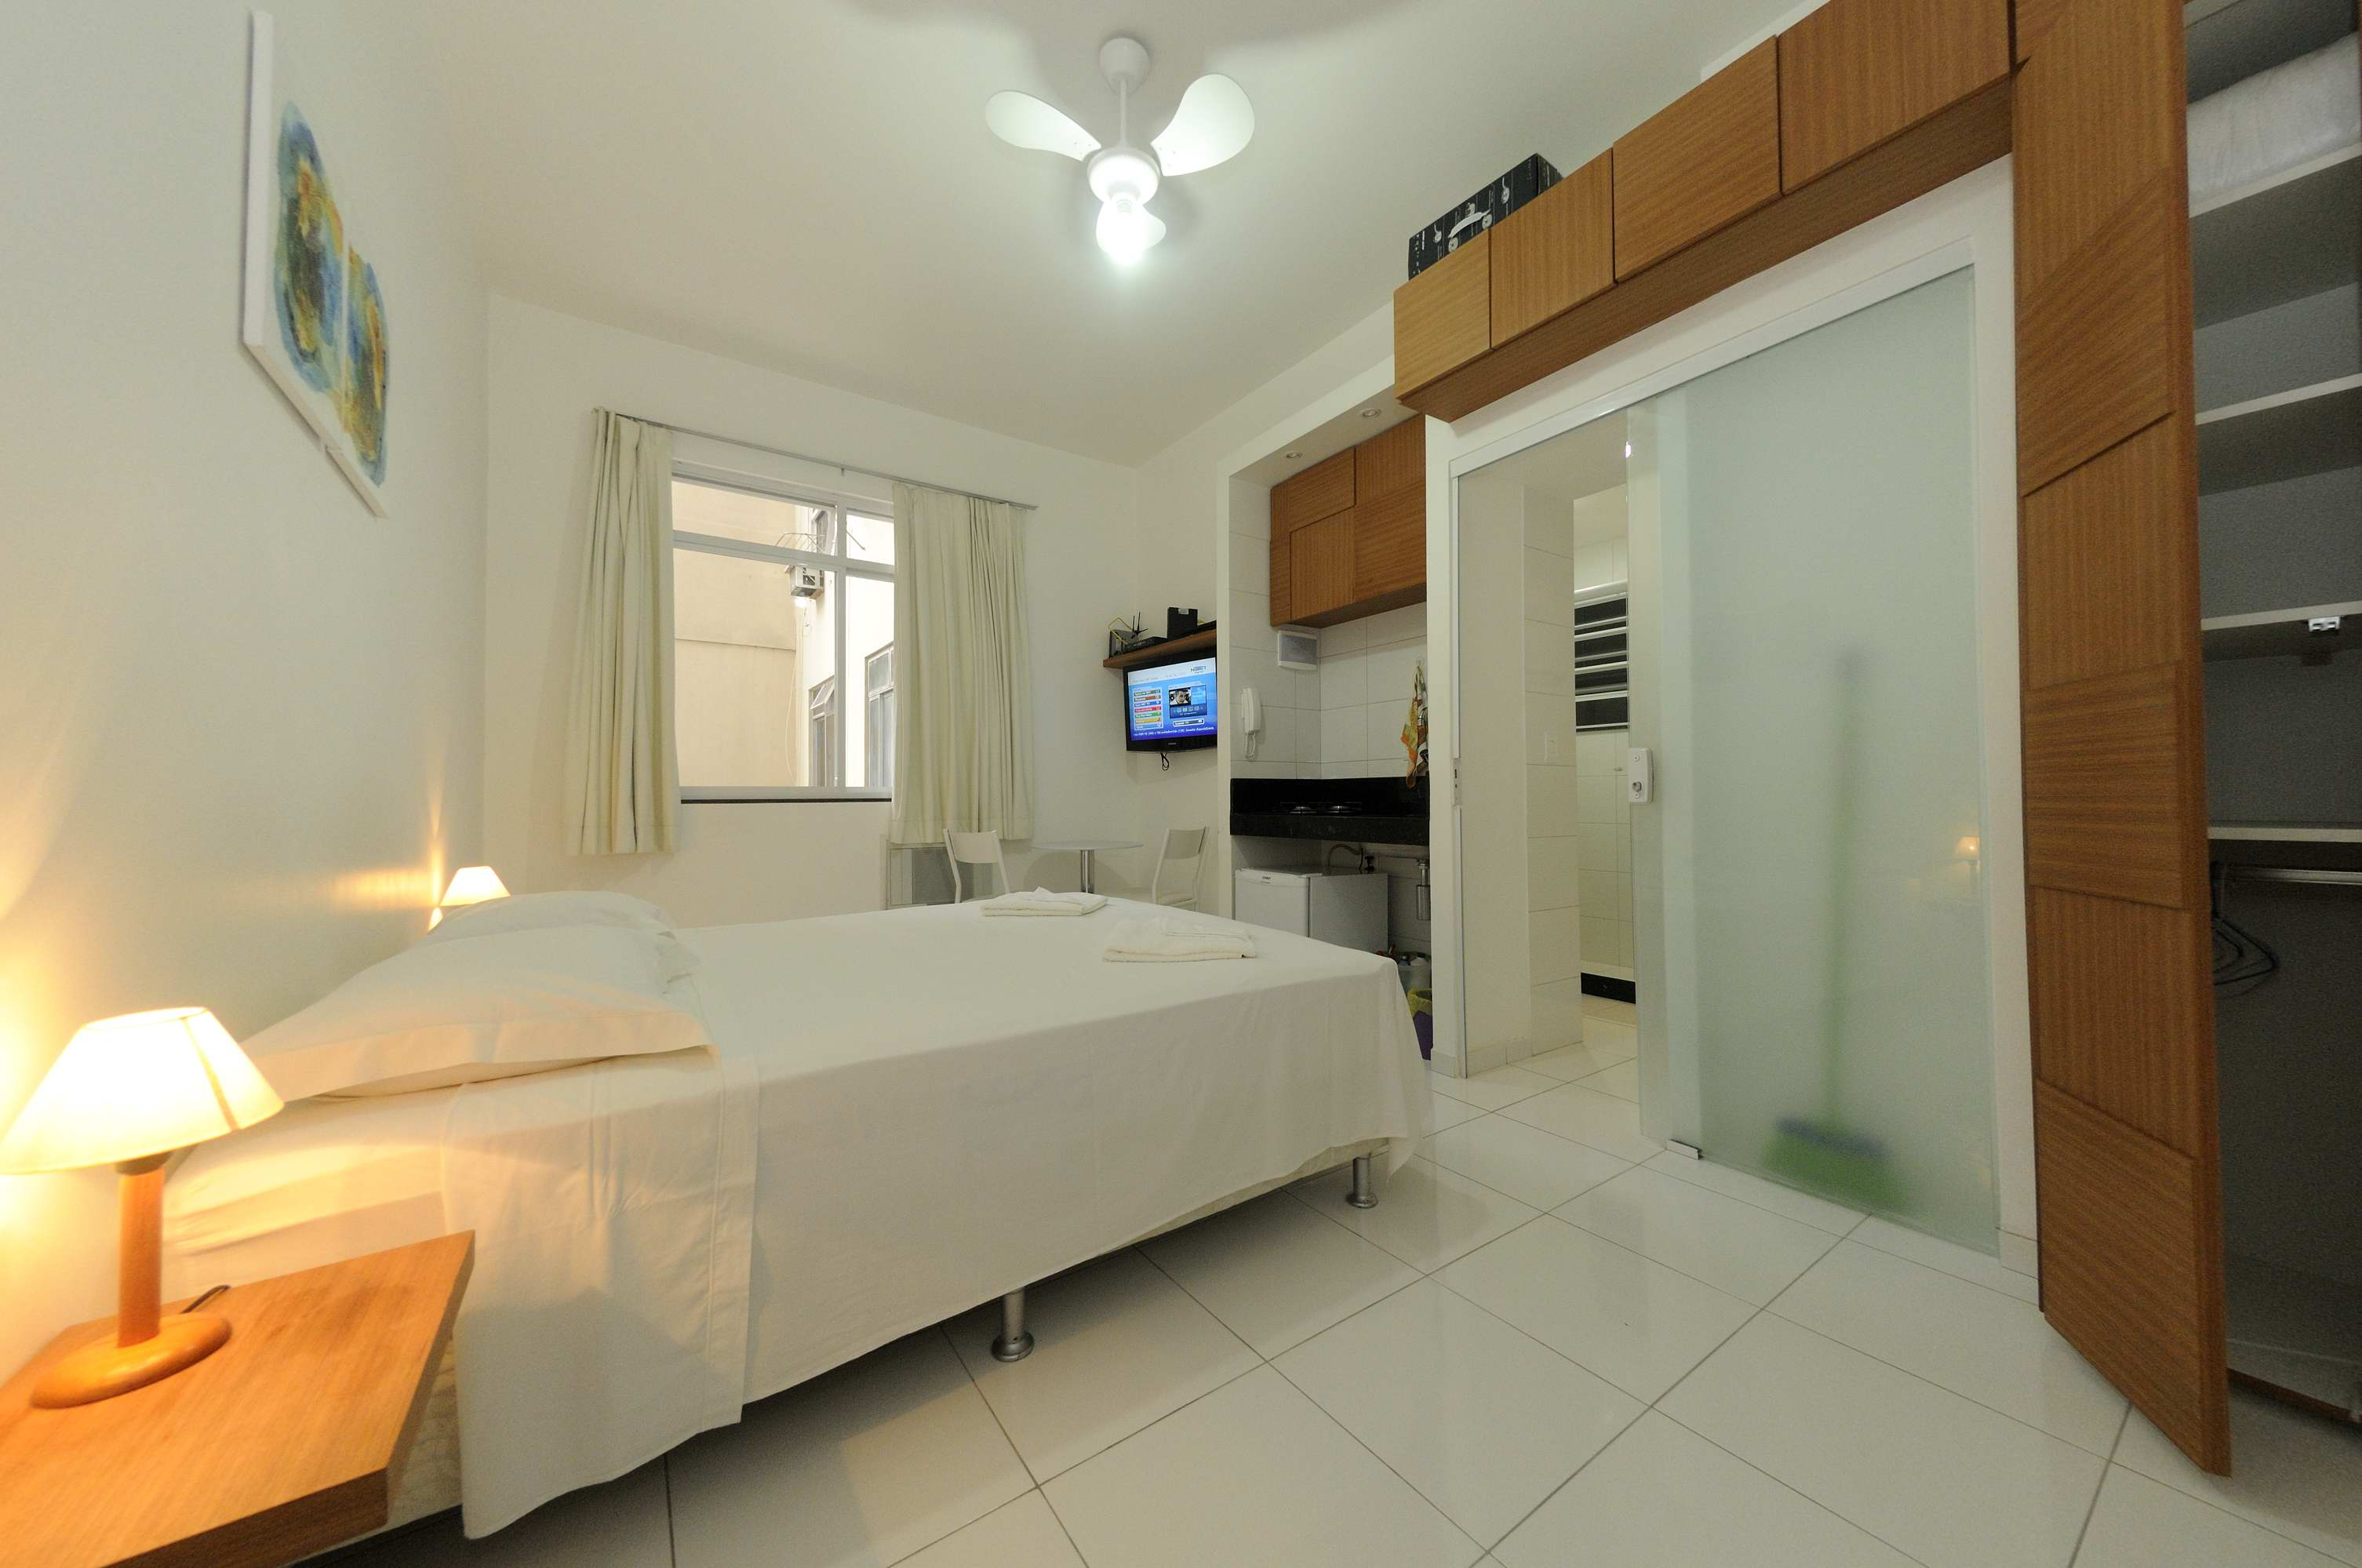 appartement in rio de janeiro copacabana objekt nr 653 max 2 personen. Black Bedroom Furniture Sets. Home Design Ideas